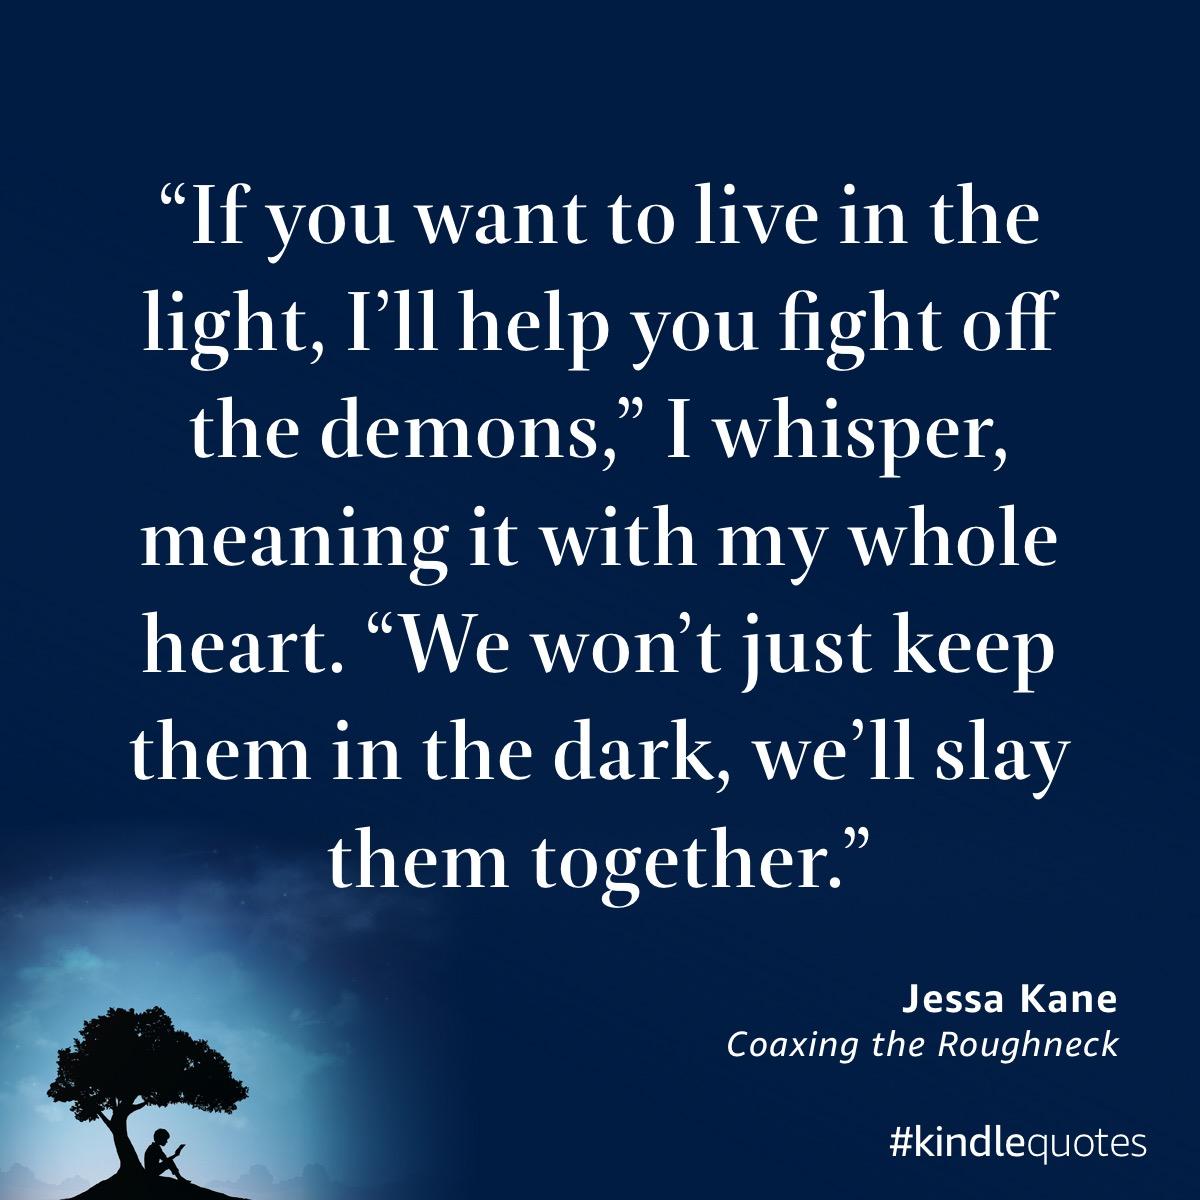 Book quote Jessa Kane